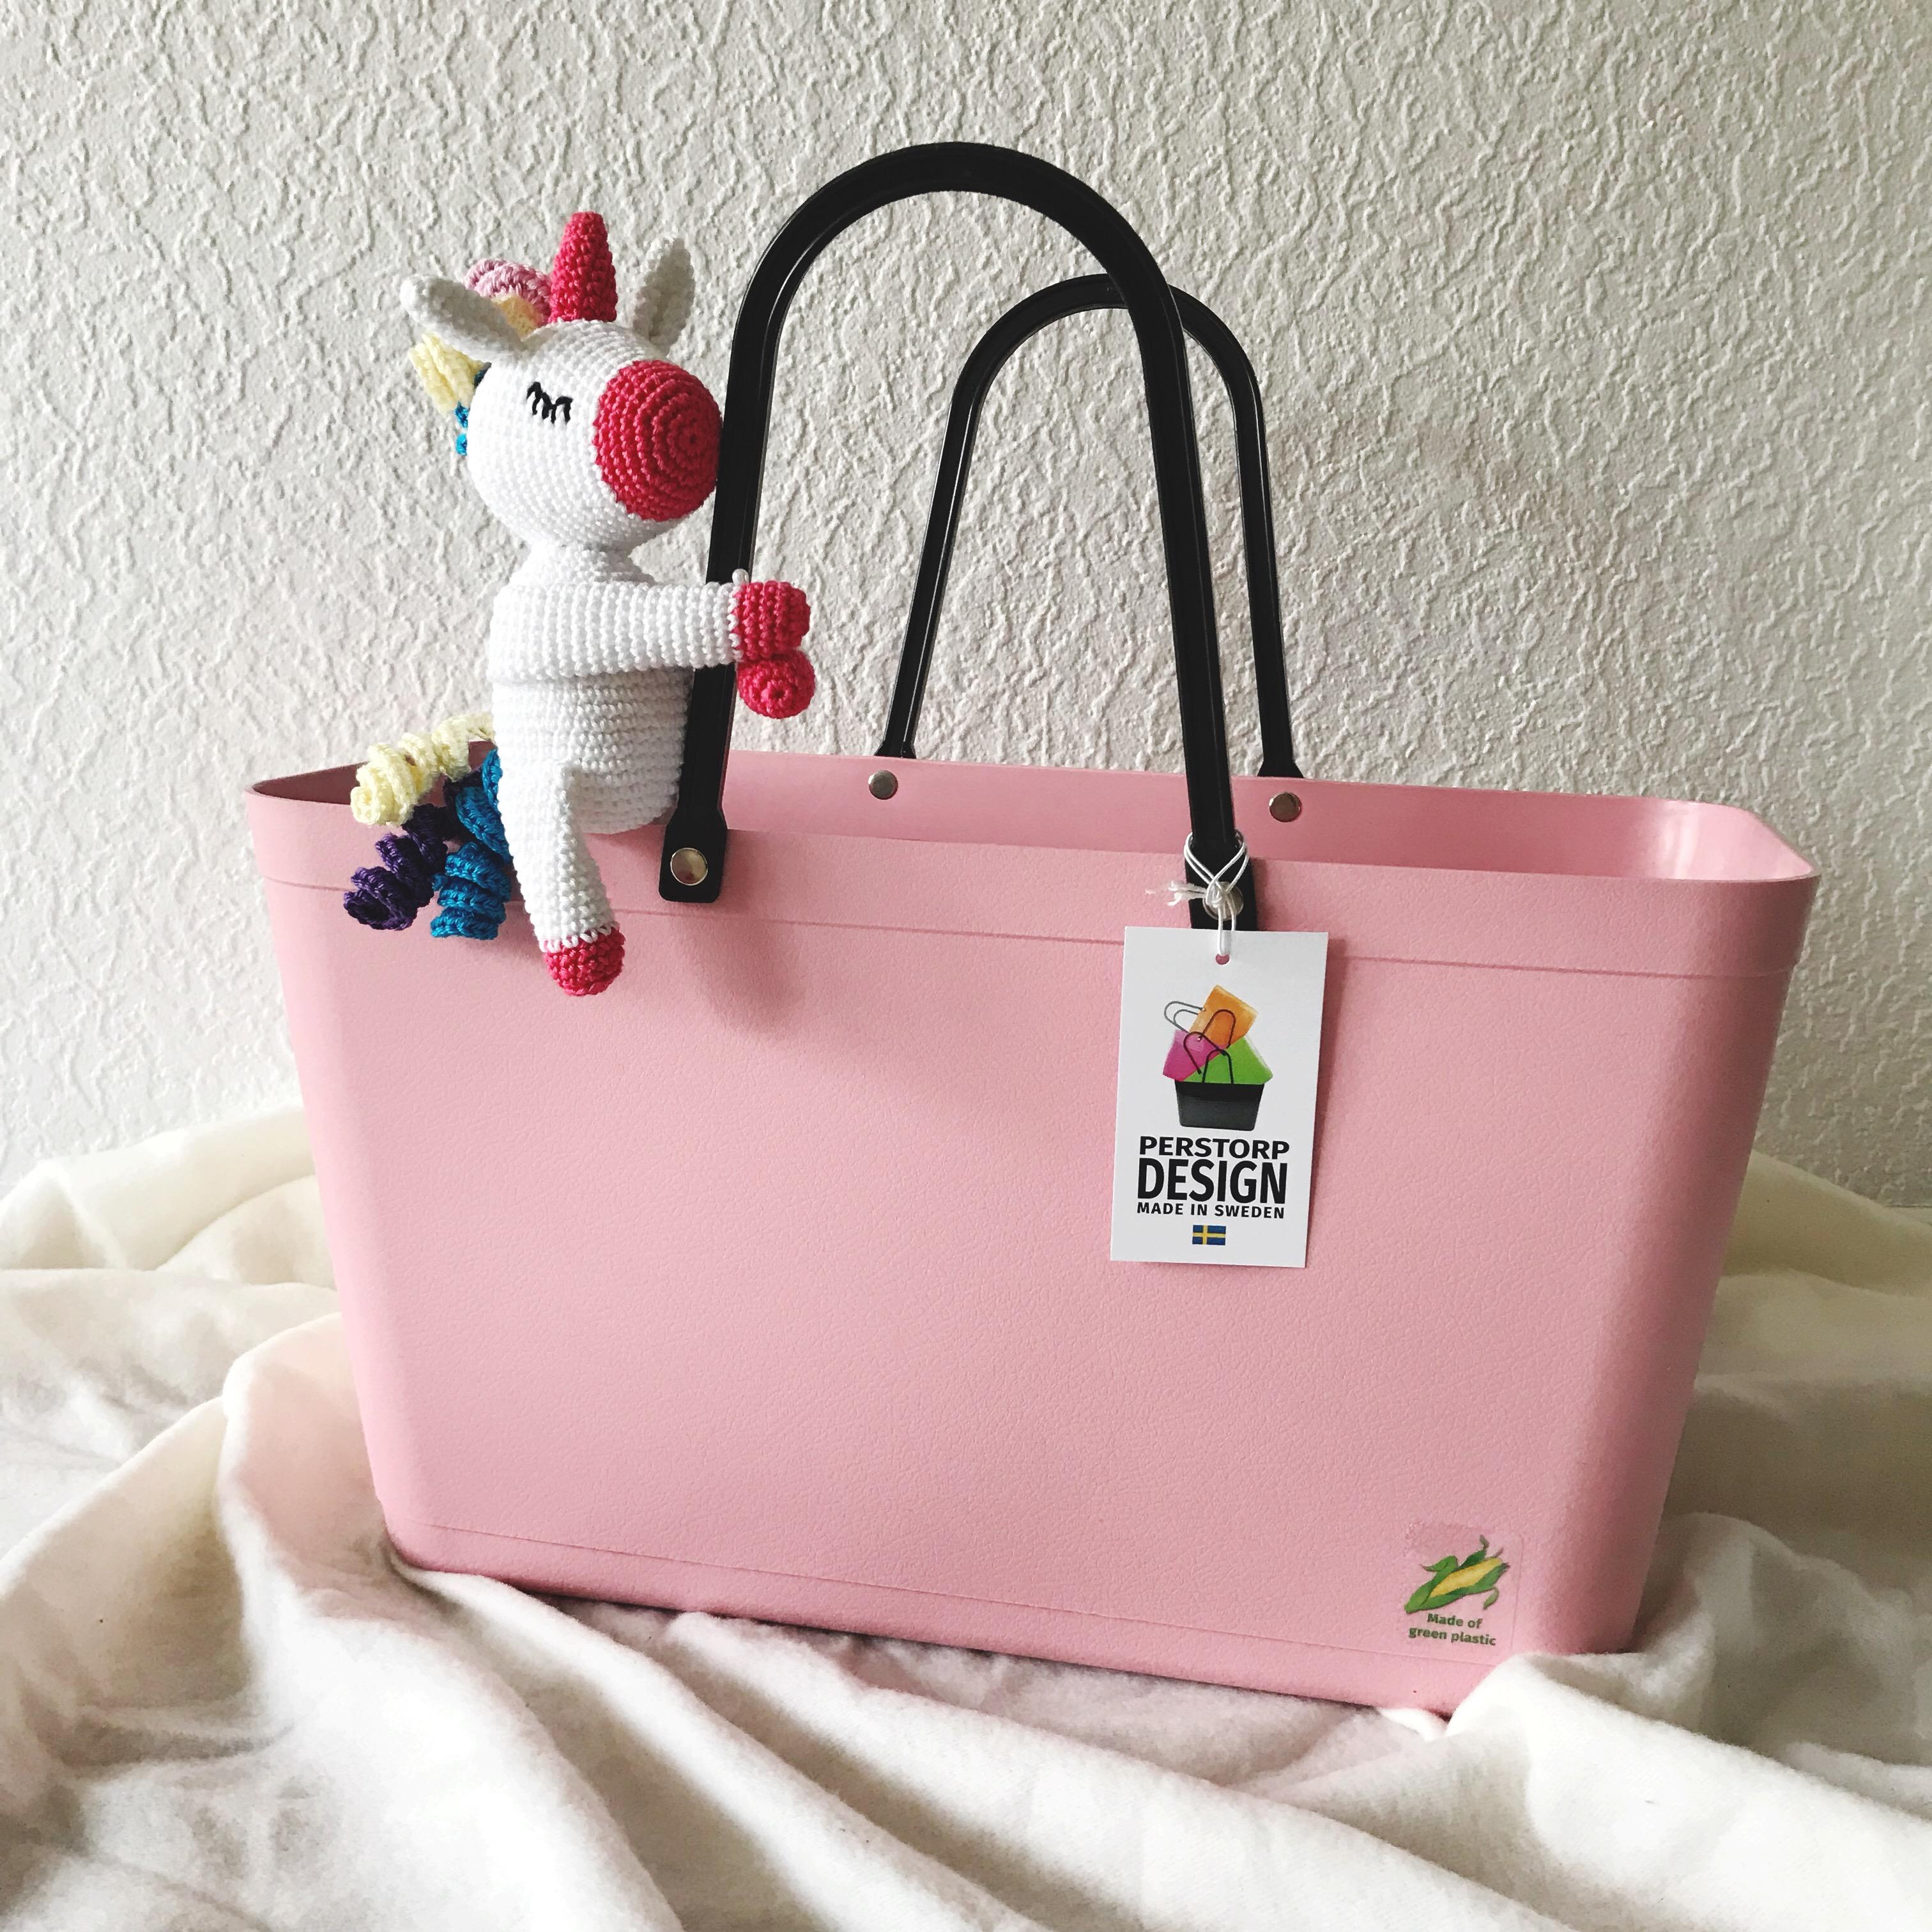 Perstorp Design Craftbag